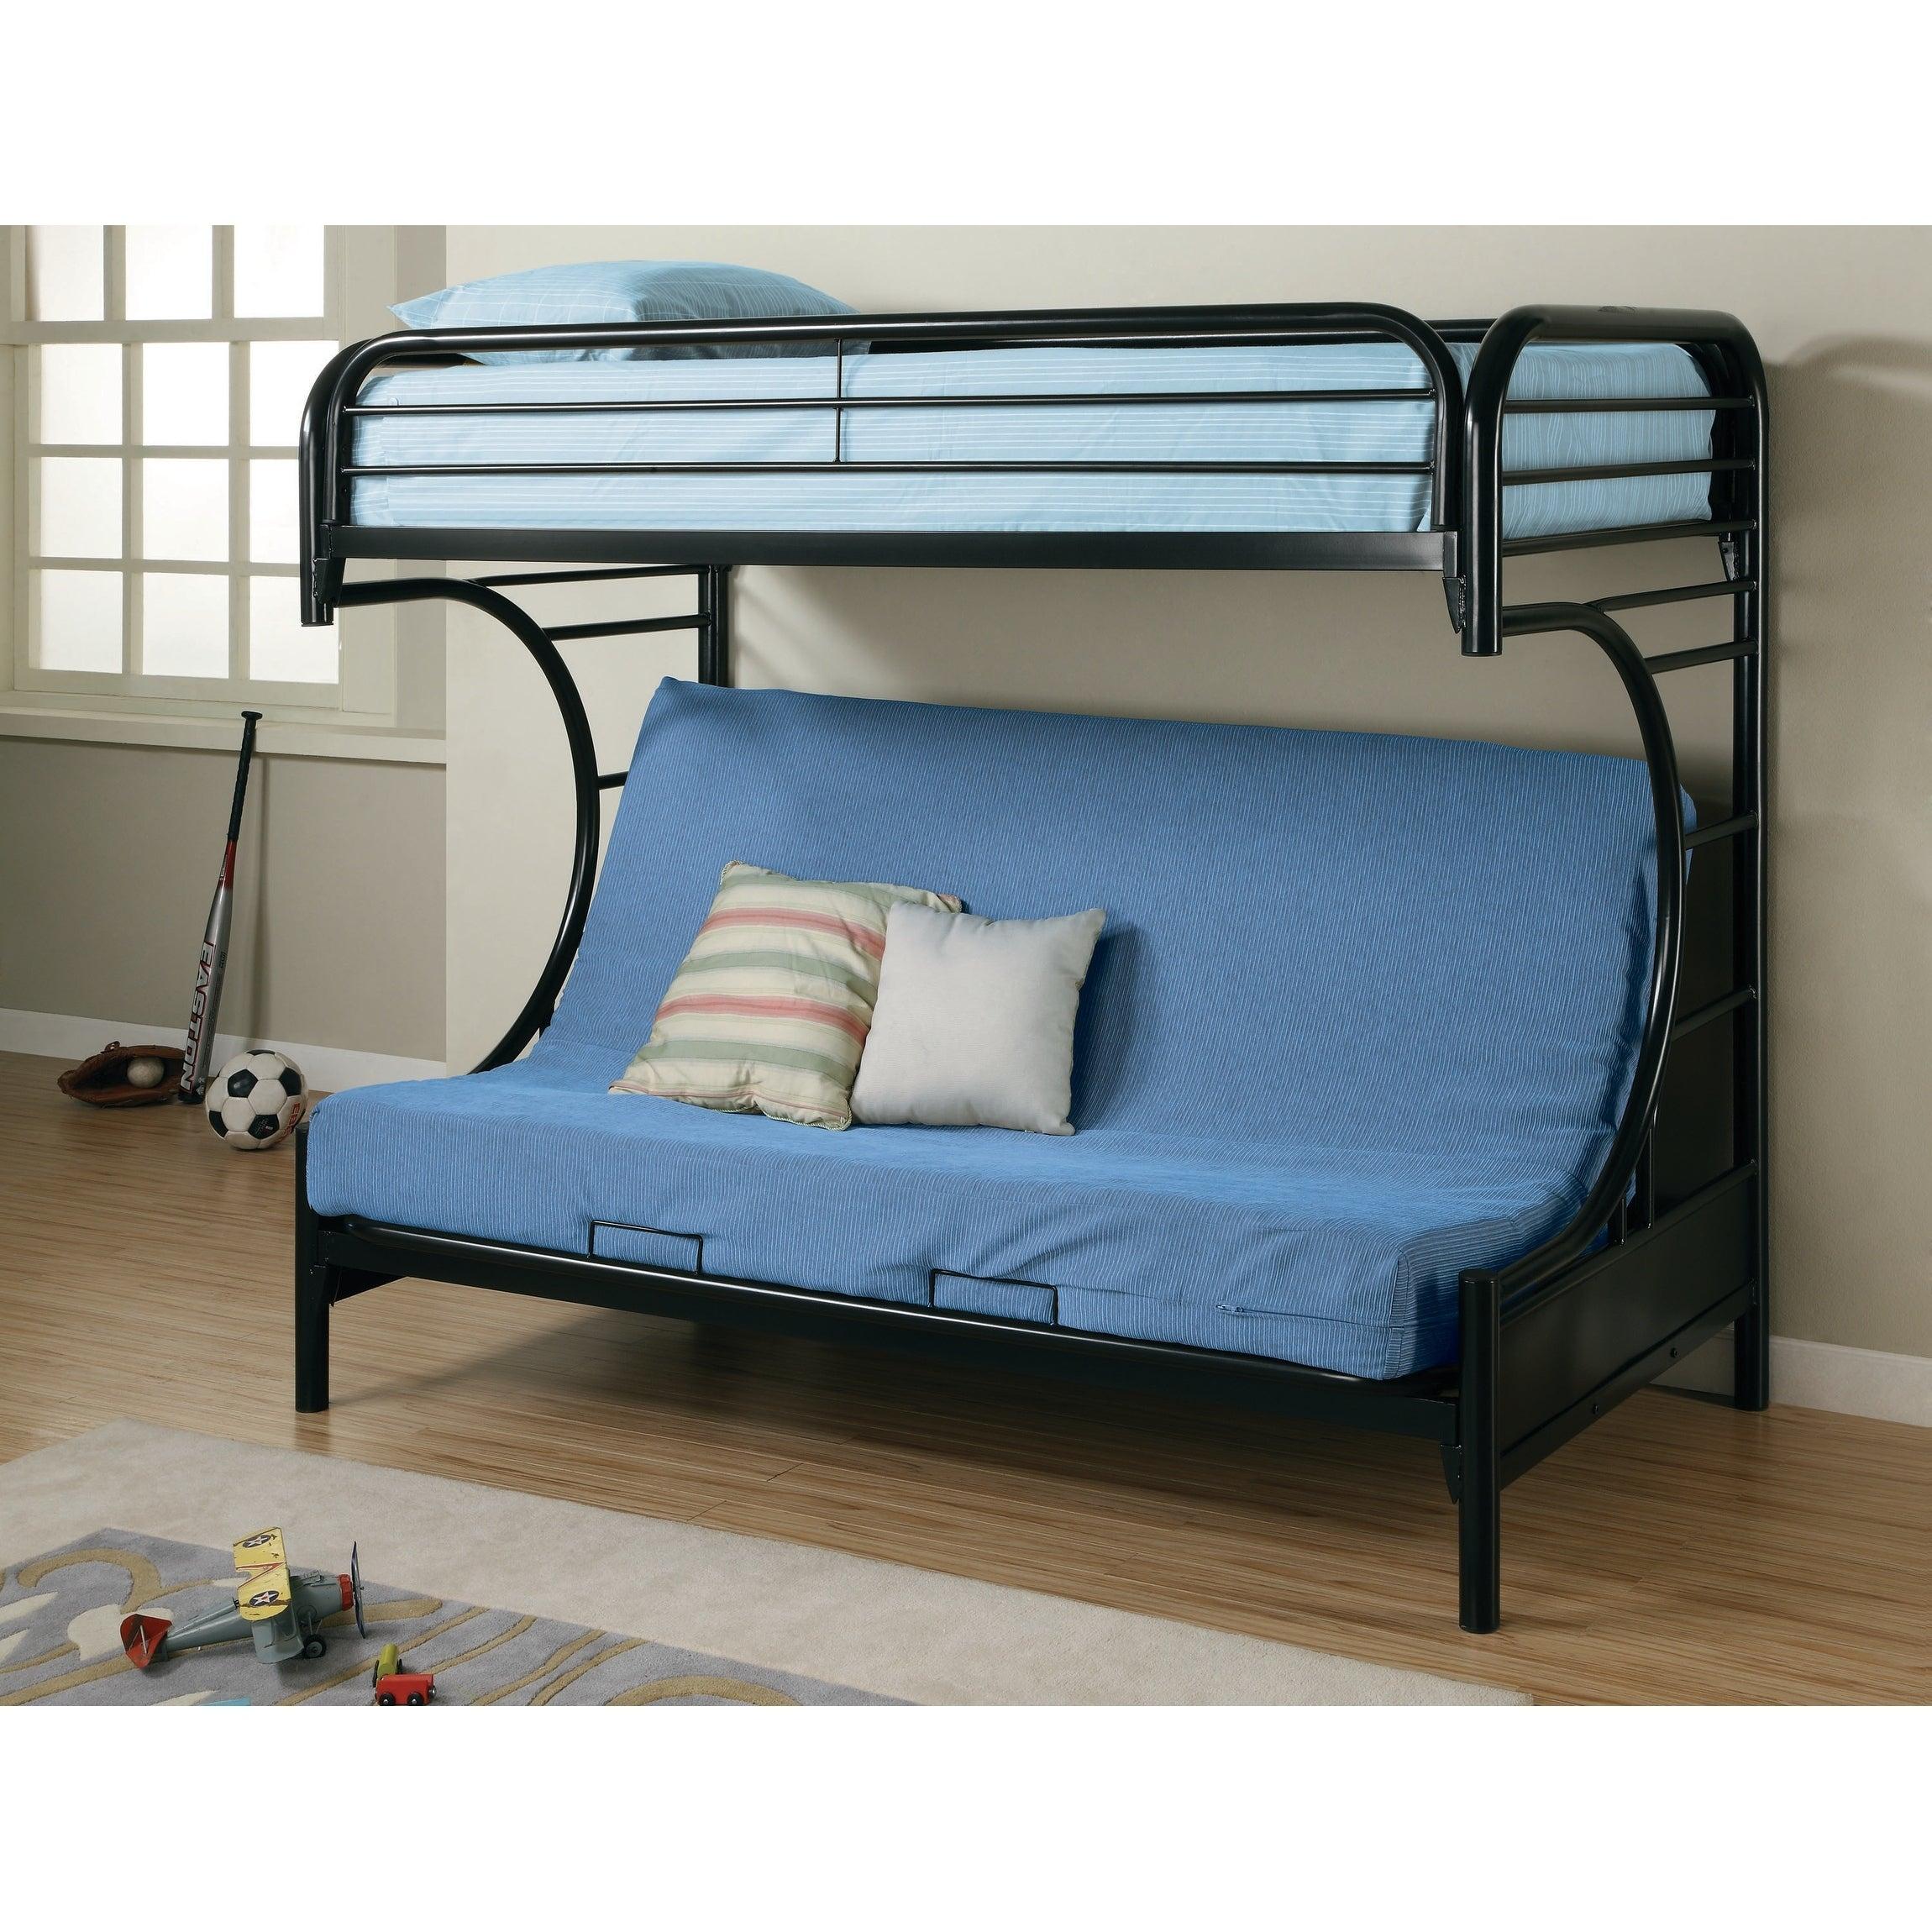 Glossy Black Futon Bunk Bed